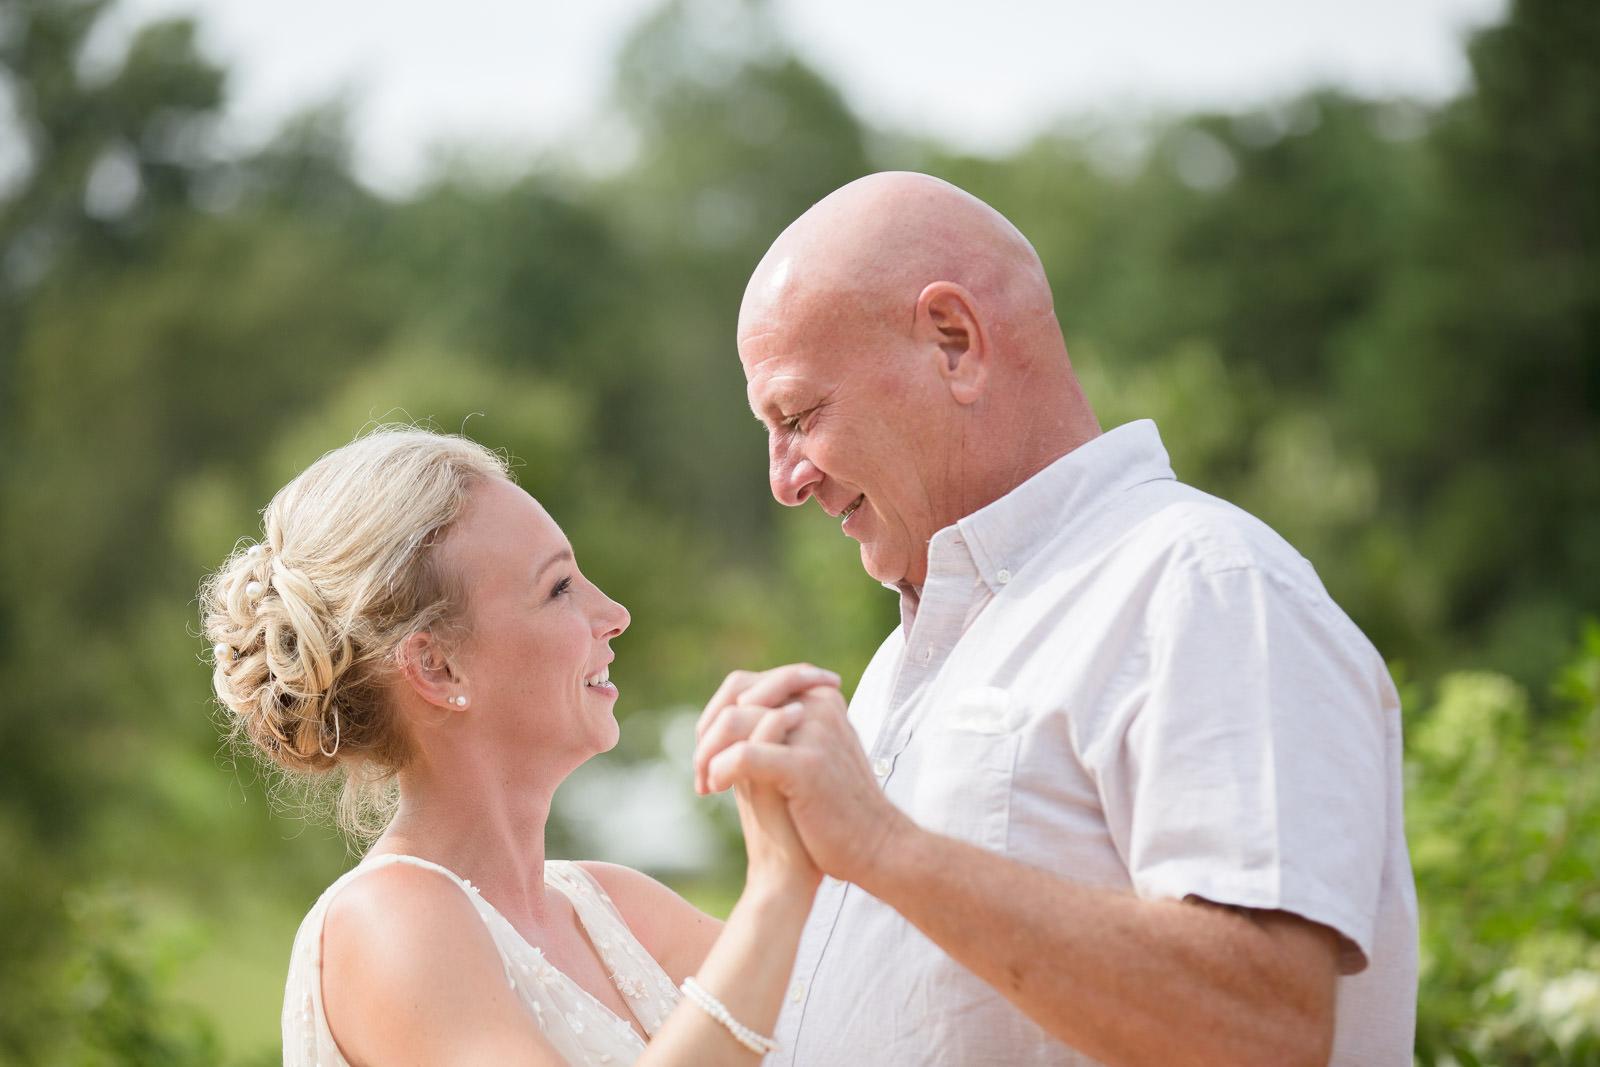 Coventry, Rhode Island, RI, Backyard Wedding, forest, earthy, wedding, tracy jenkins photography, wedding photographer, ri wedding photographer, Rhode Island Wedding photographer, father daughter dance